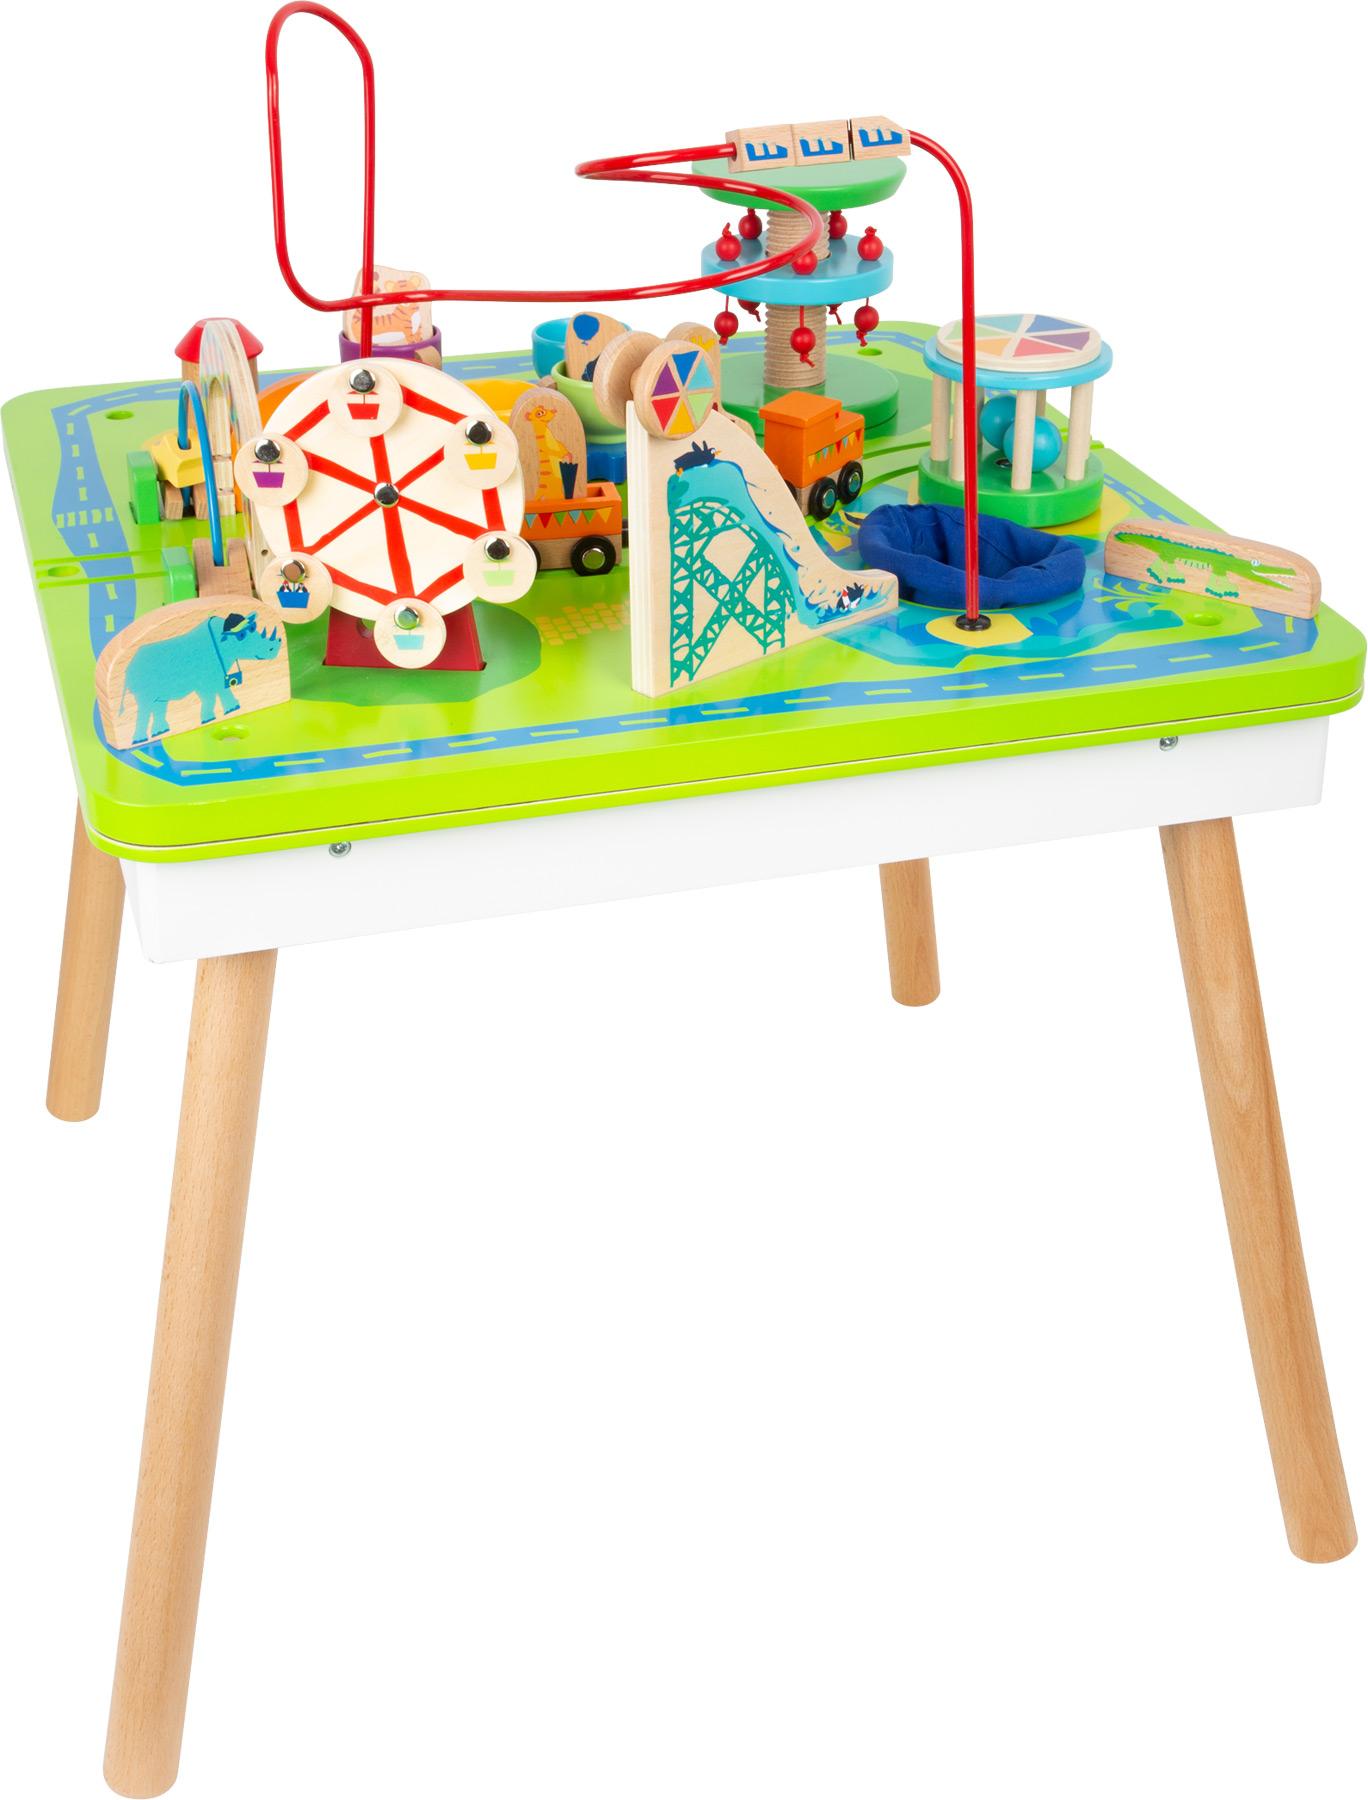 Table de jeu Parc d\'attractions 3 en 1